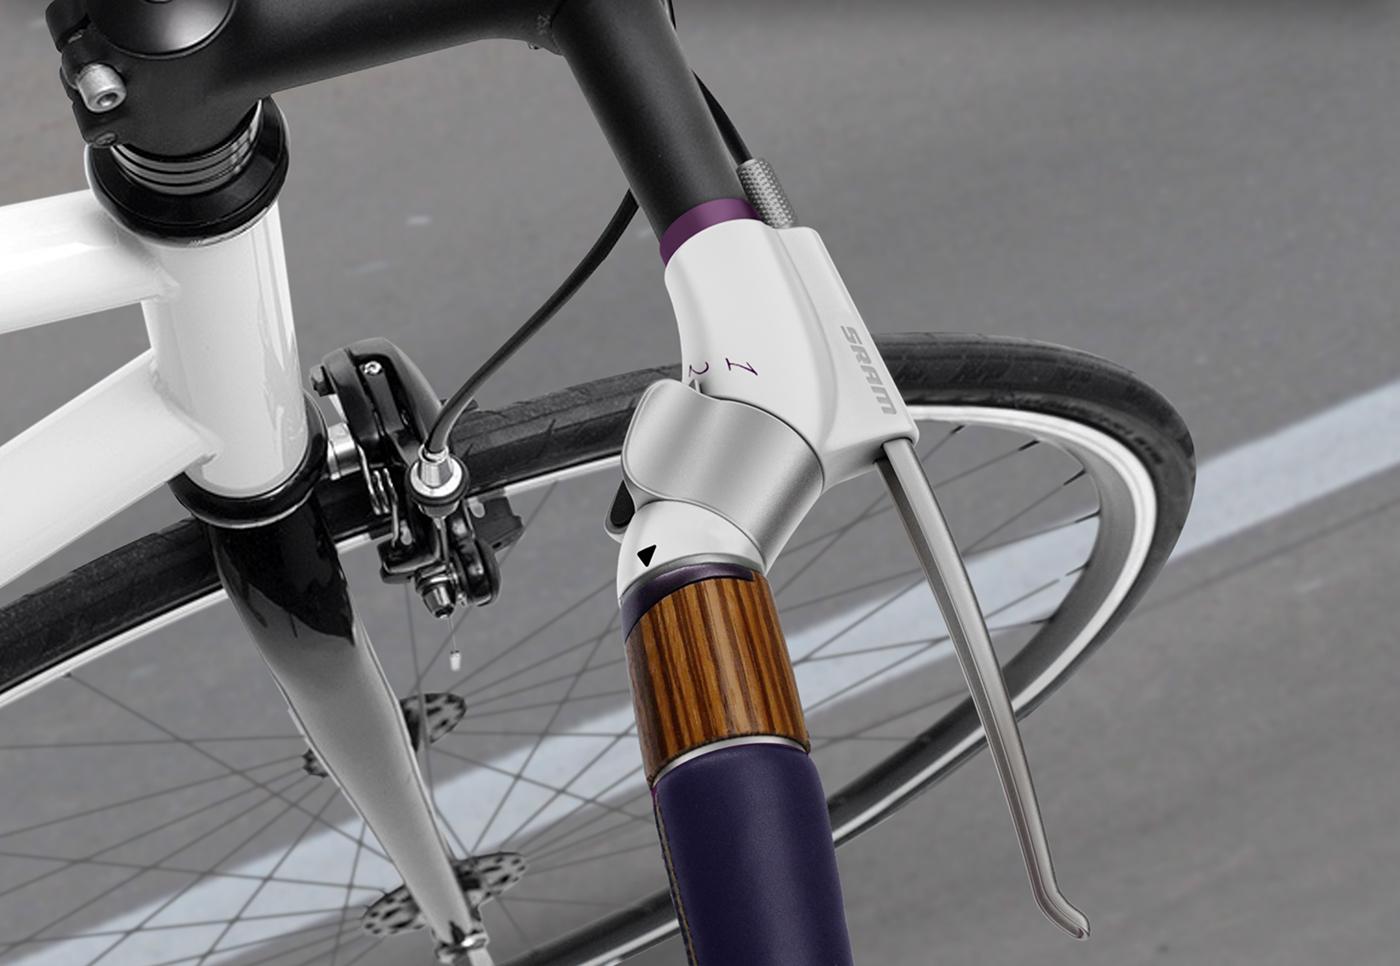 Bike Bicycle gear shift Handlebar modular colors leather wood Brake